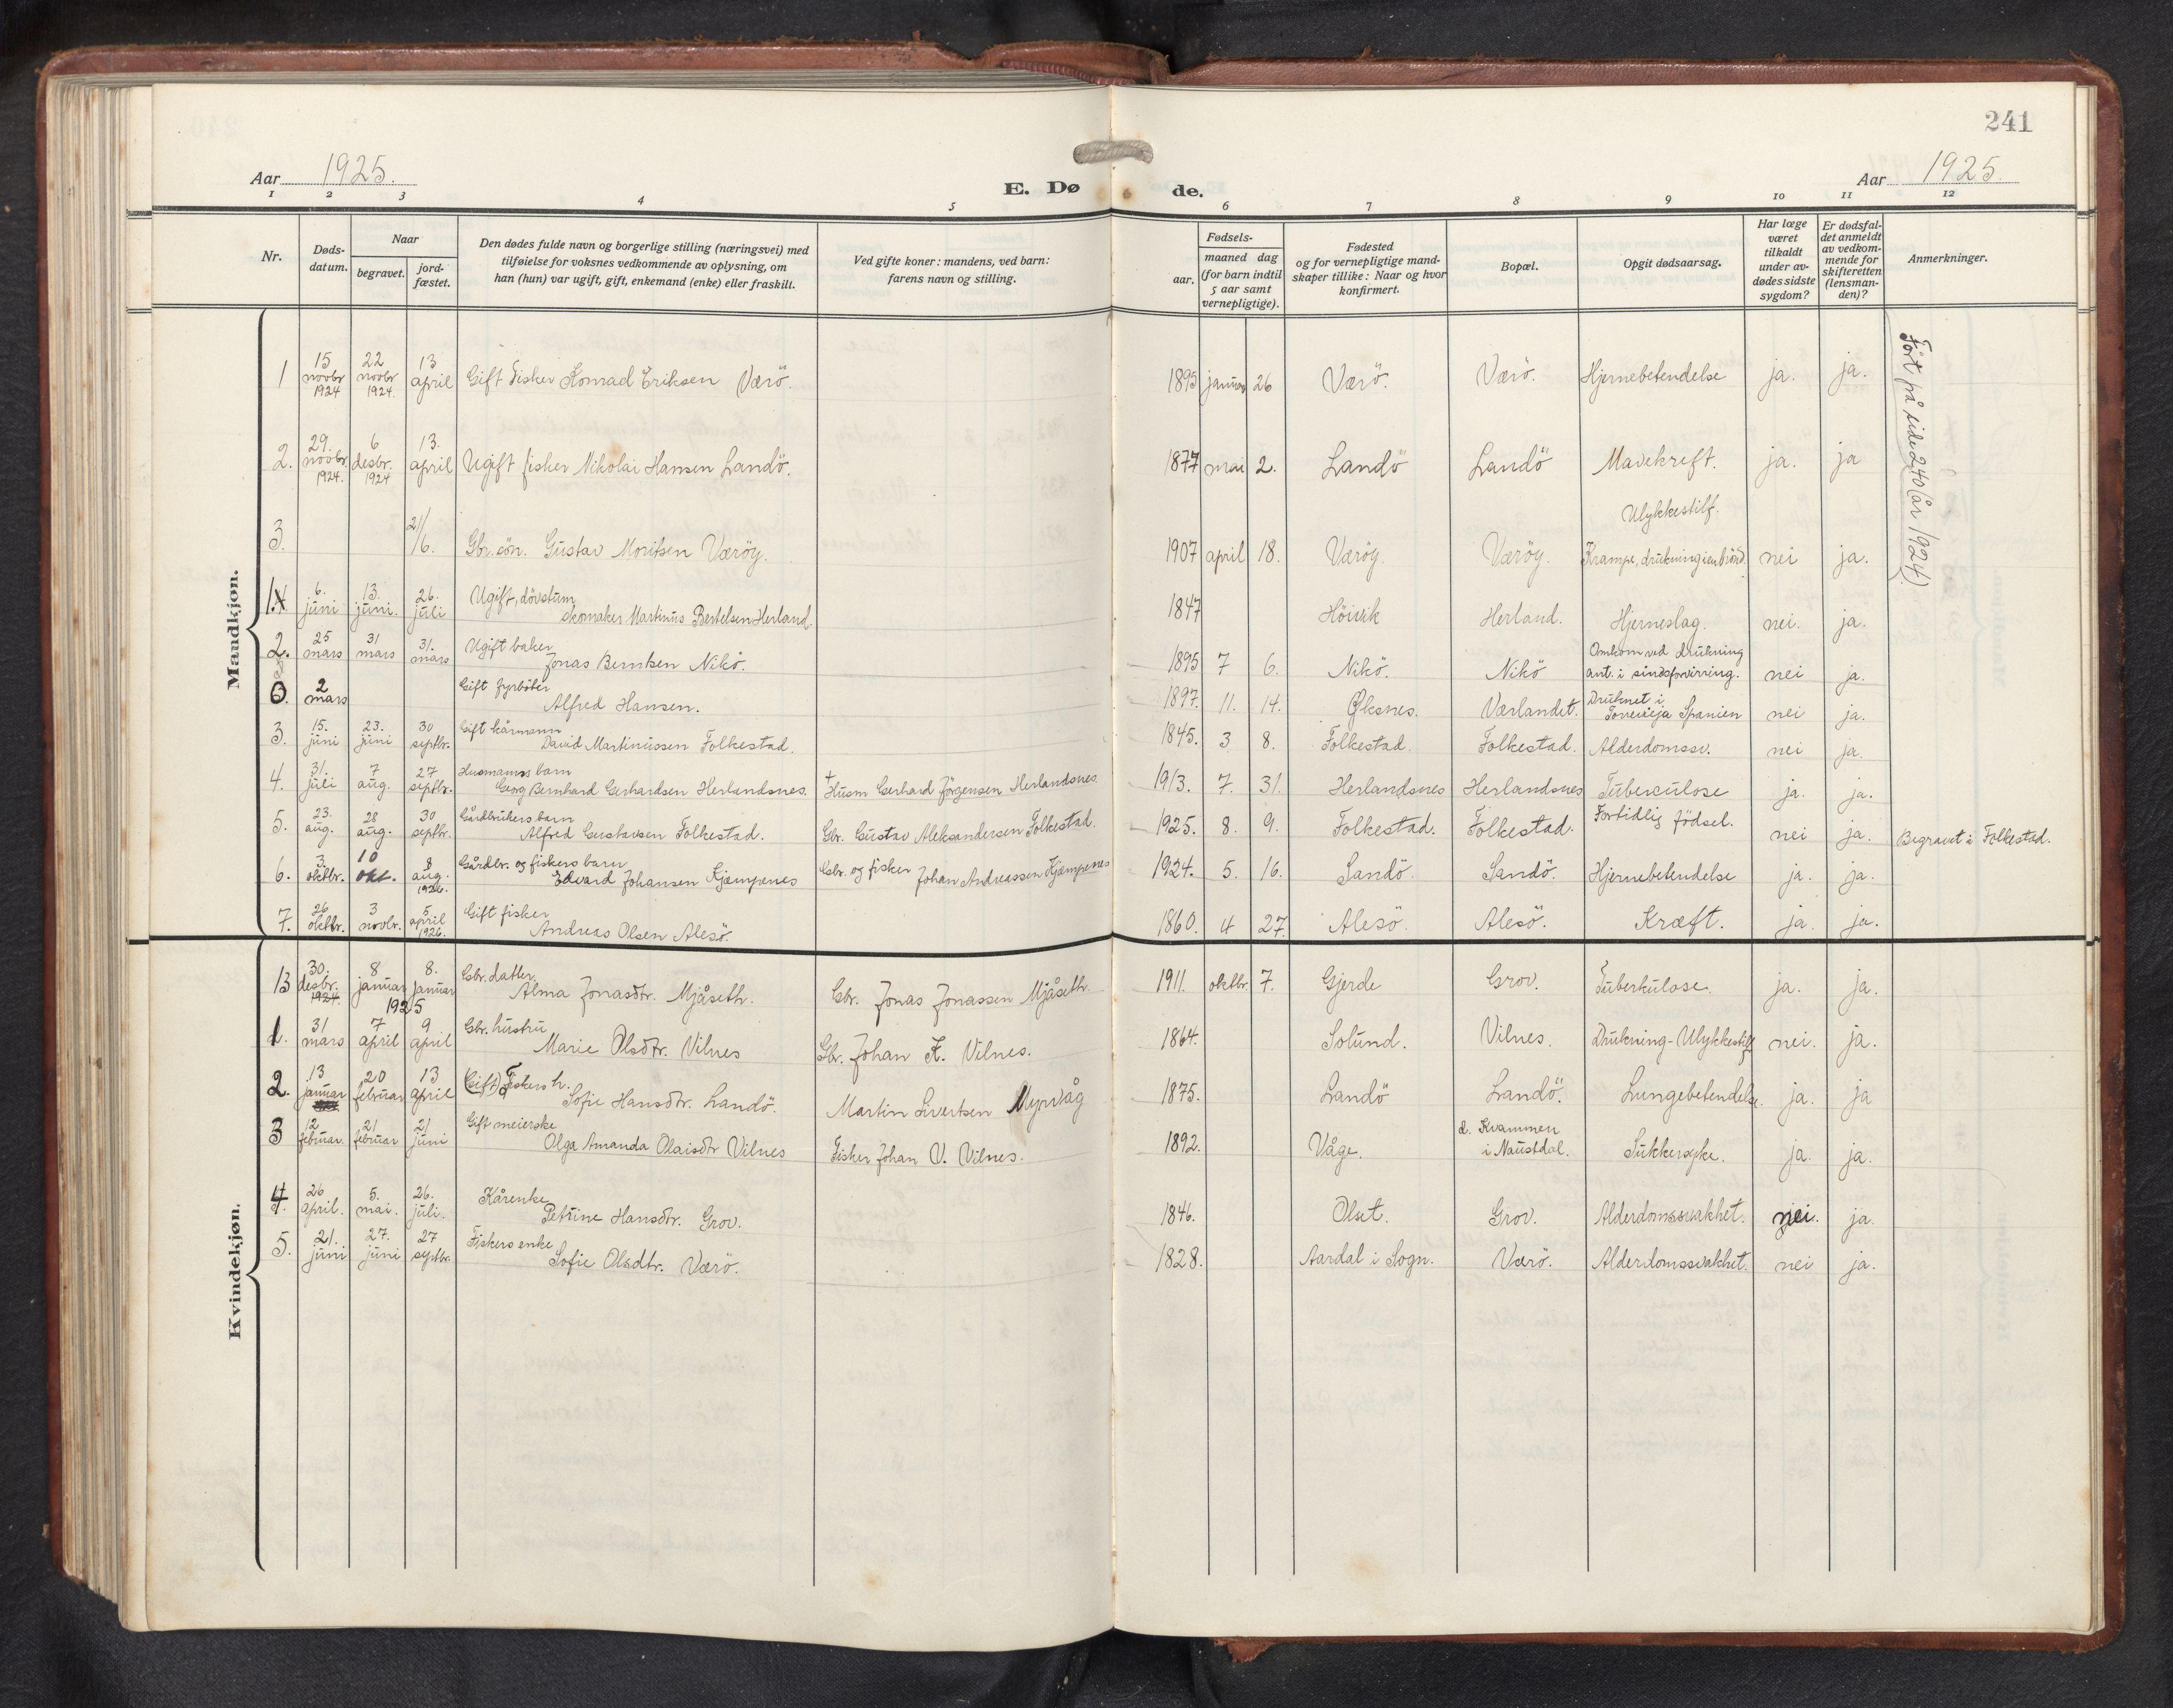 SAB, Askvoll sokneprestembete, H/Hab/Habb/L0002: Klokkerbok nr. B 2, 1910-1947, s. 240b-241a